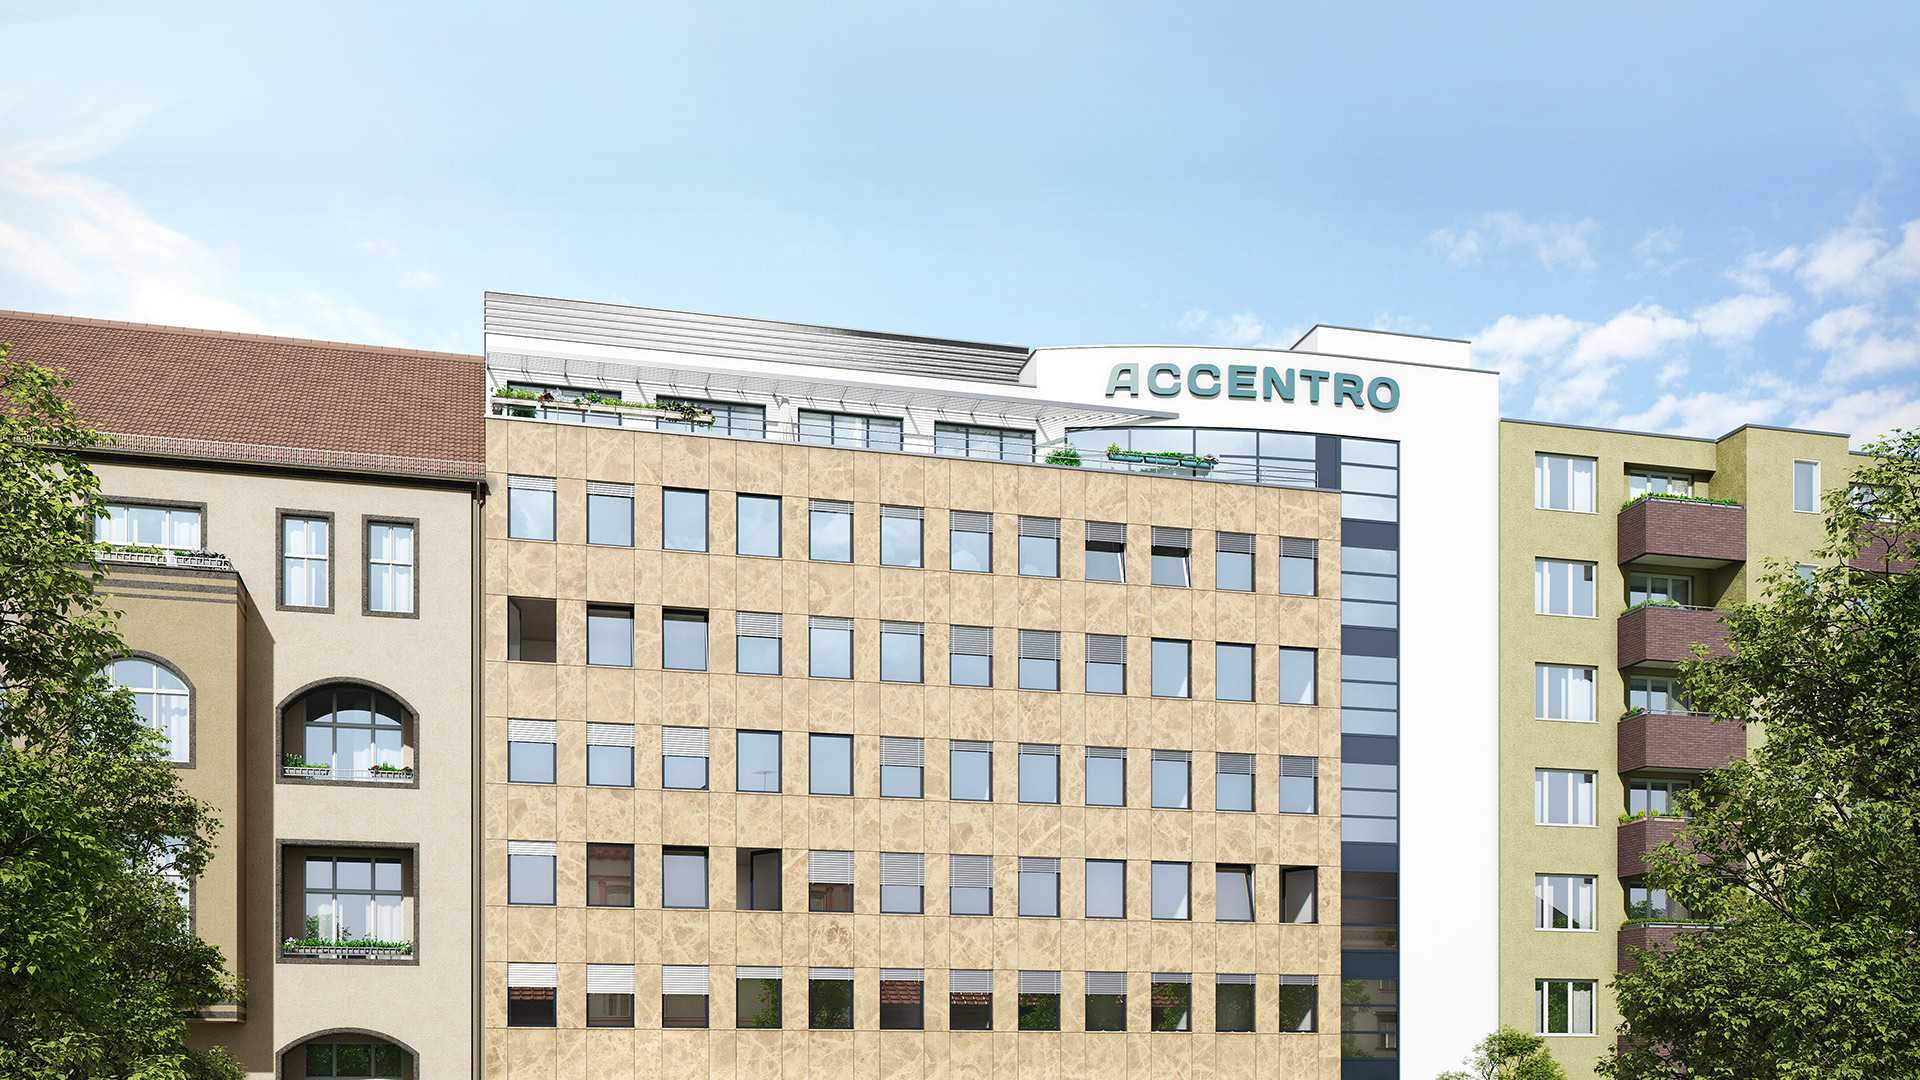 Accentro Real Estate AG